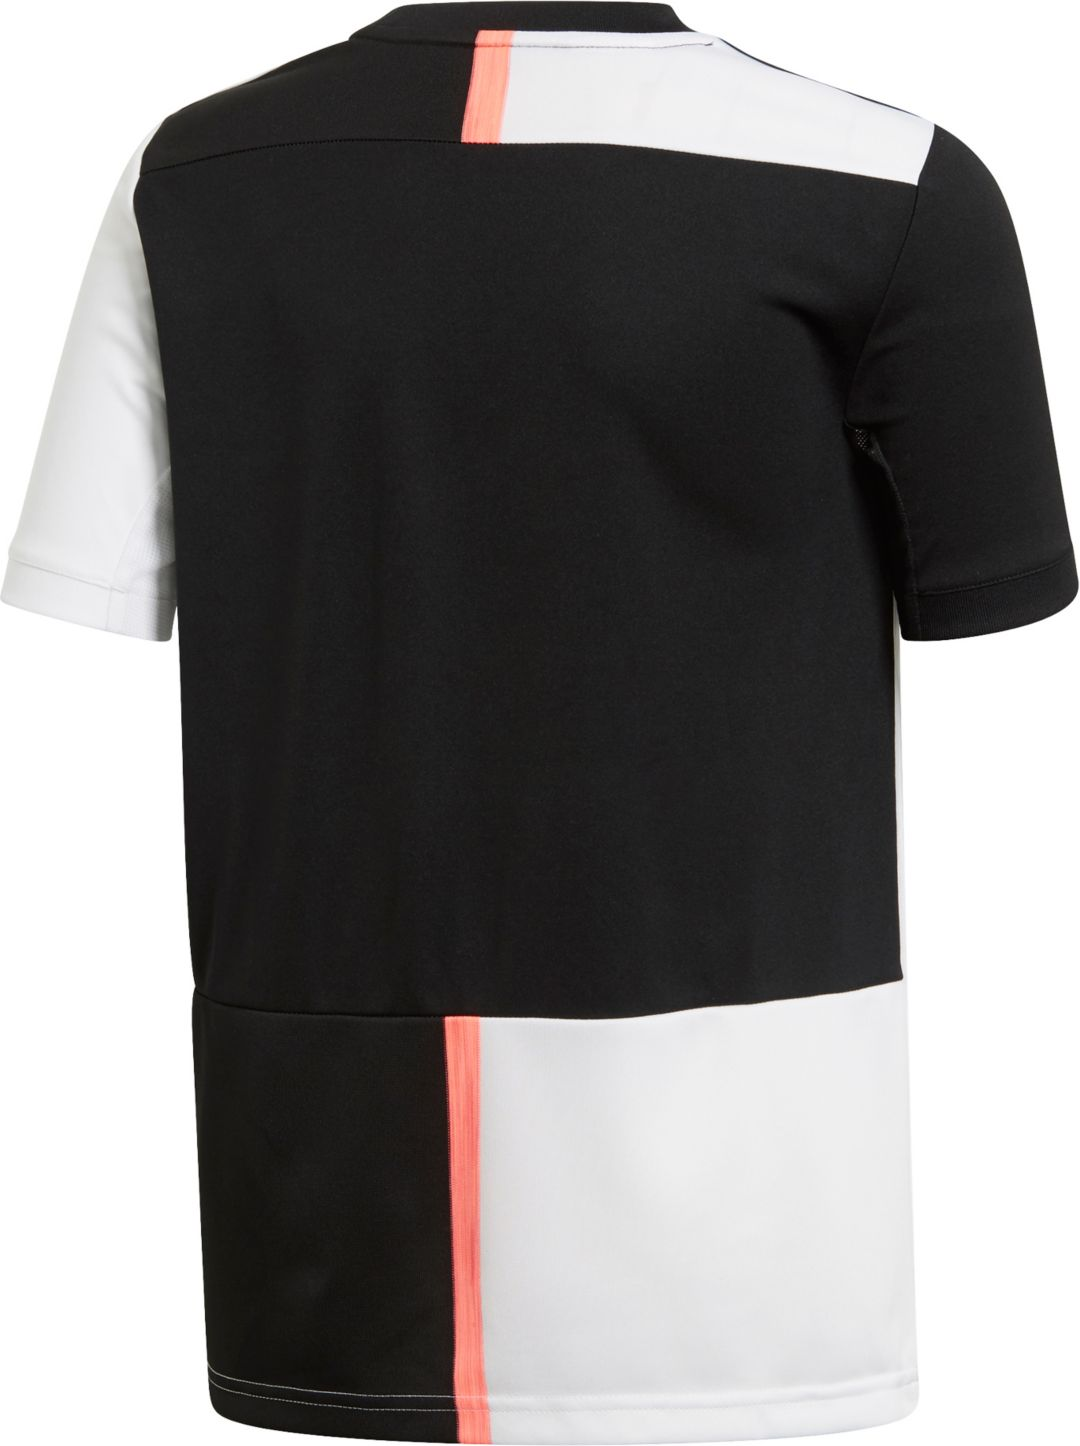 the latest b2e11 cc0d8 adidas Youth Juventus '19 Stadium Home Replica Jersey